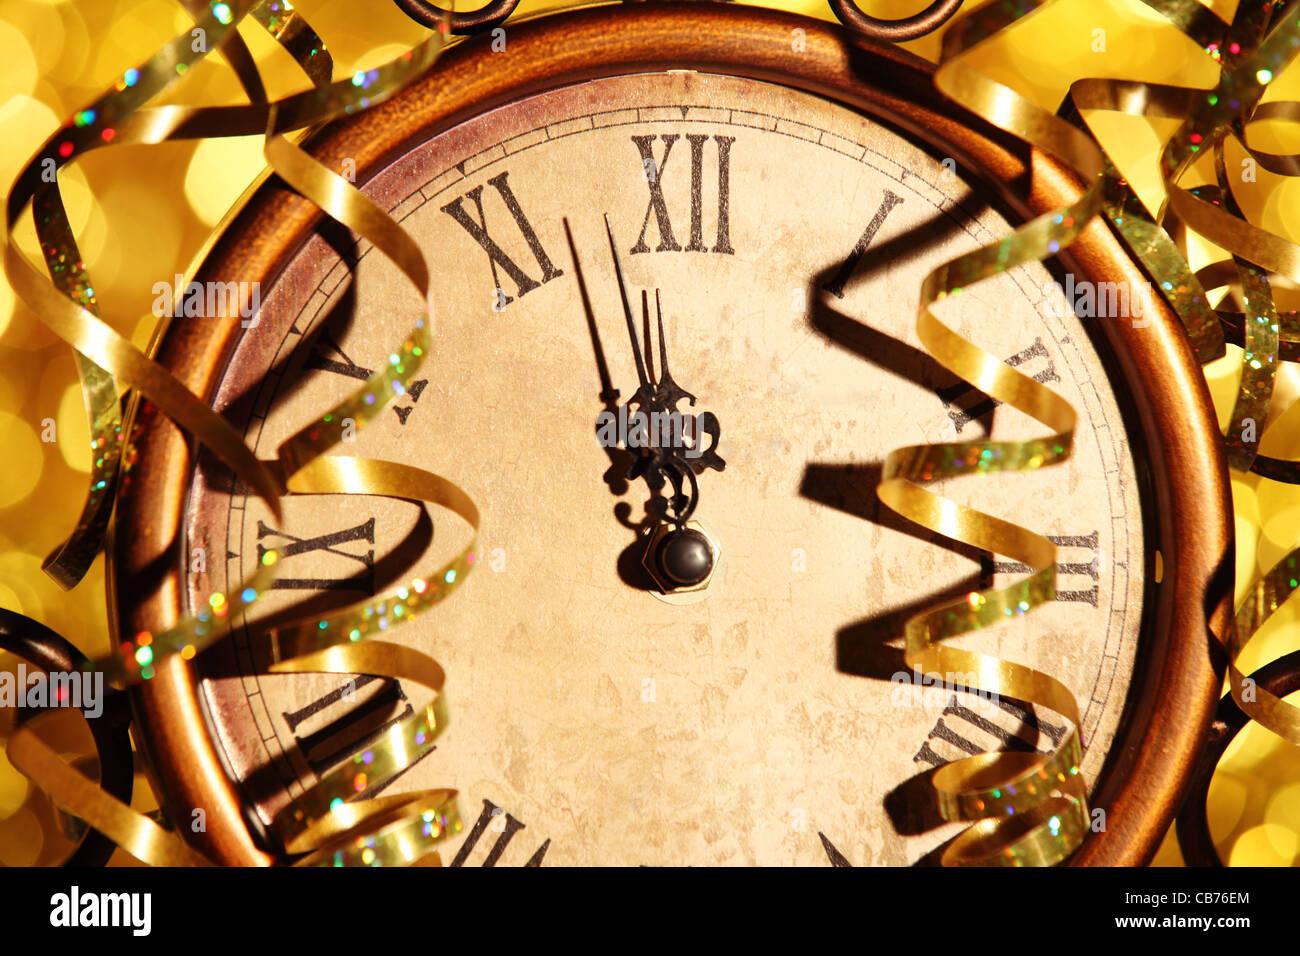 Nearly Twelve O'clock Midnight,New Year Concept. - Stock Image